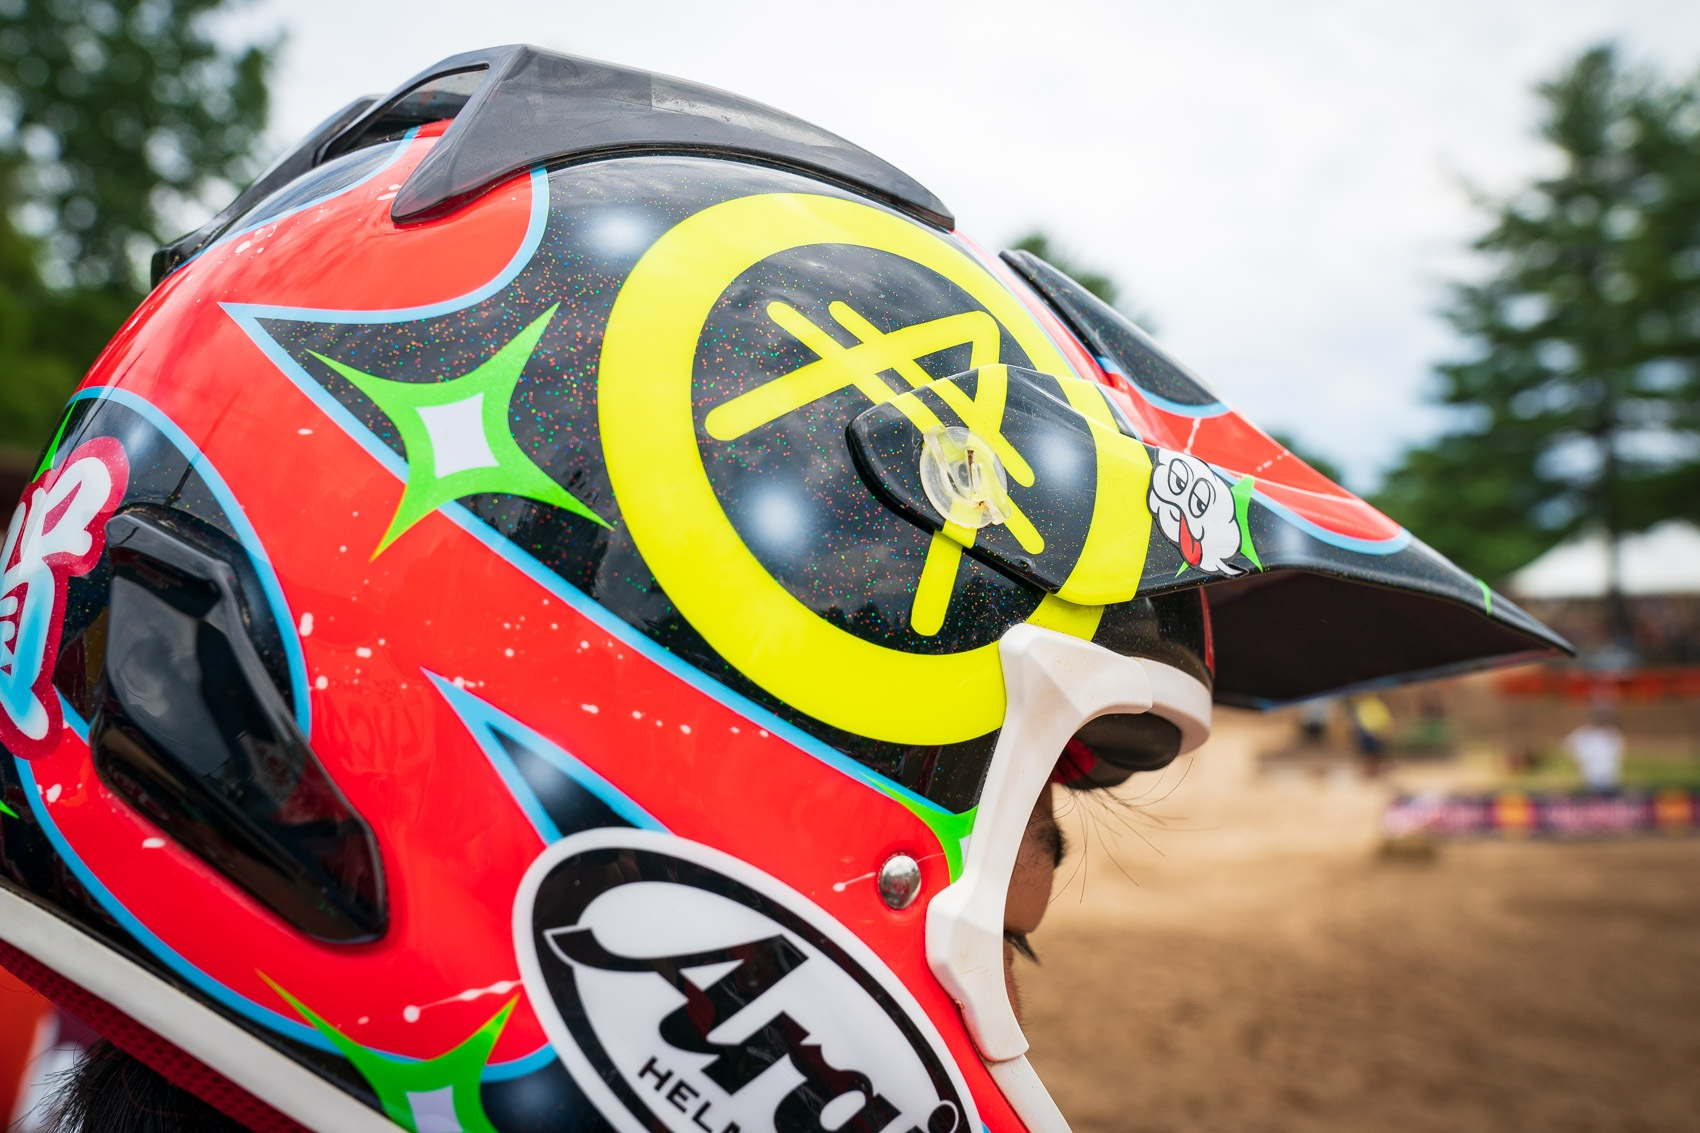 2019 Southwick Motocross Kickstart Swapmoto Live